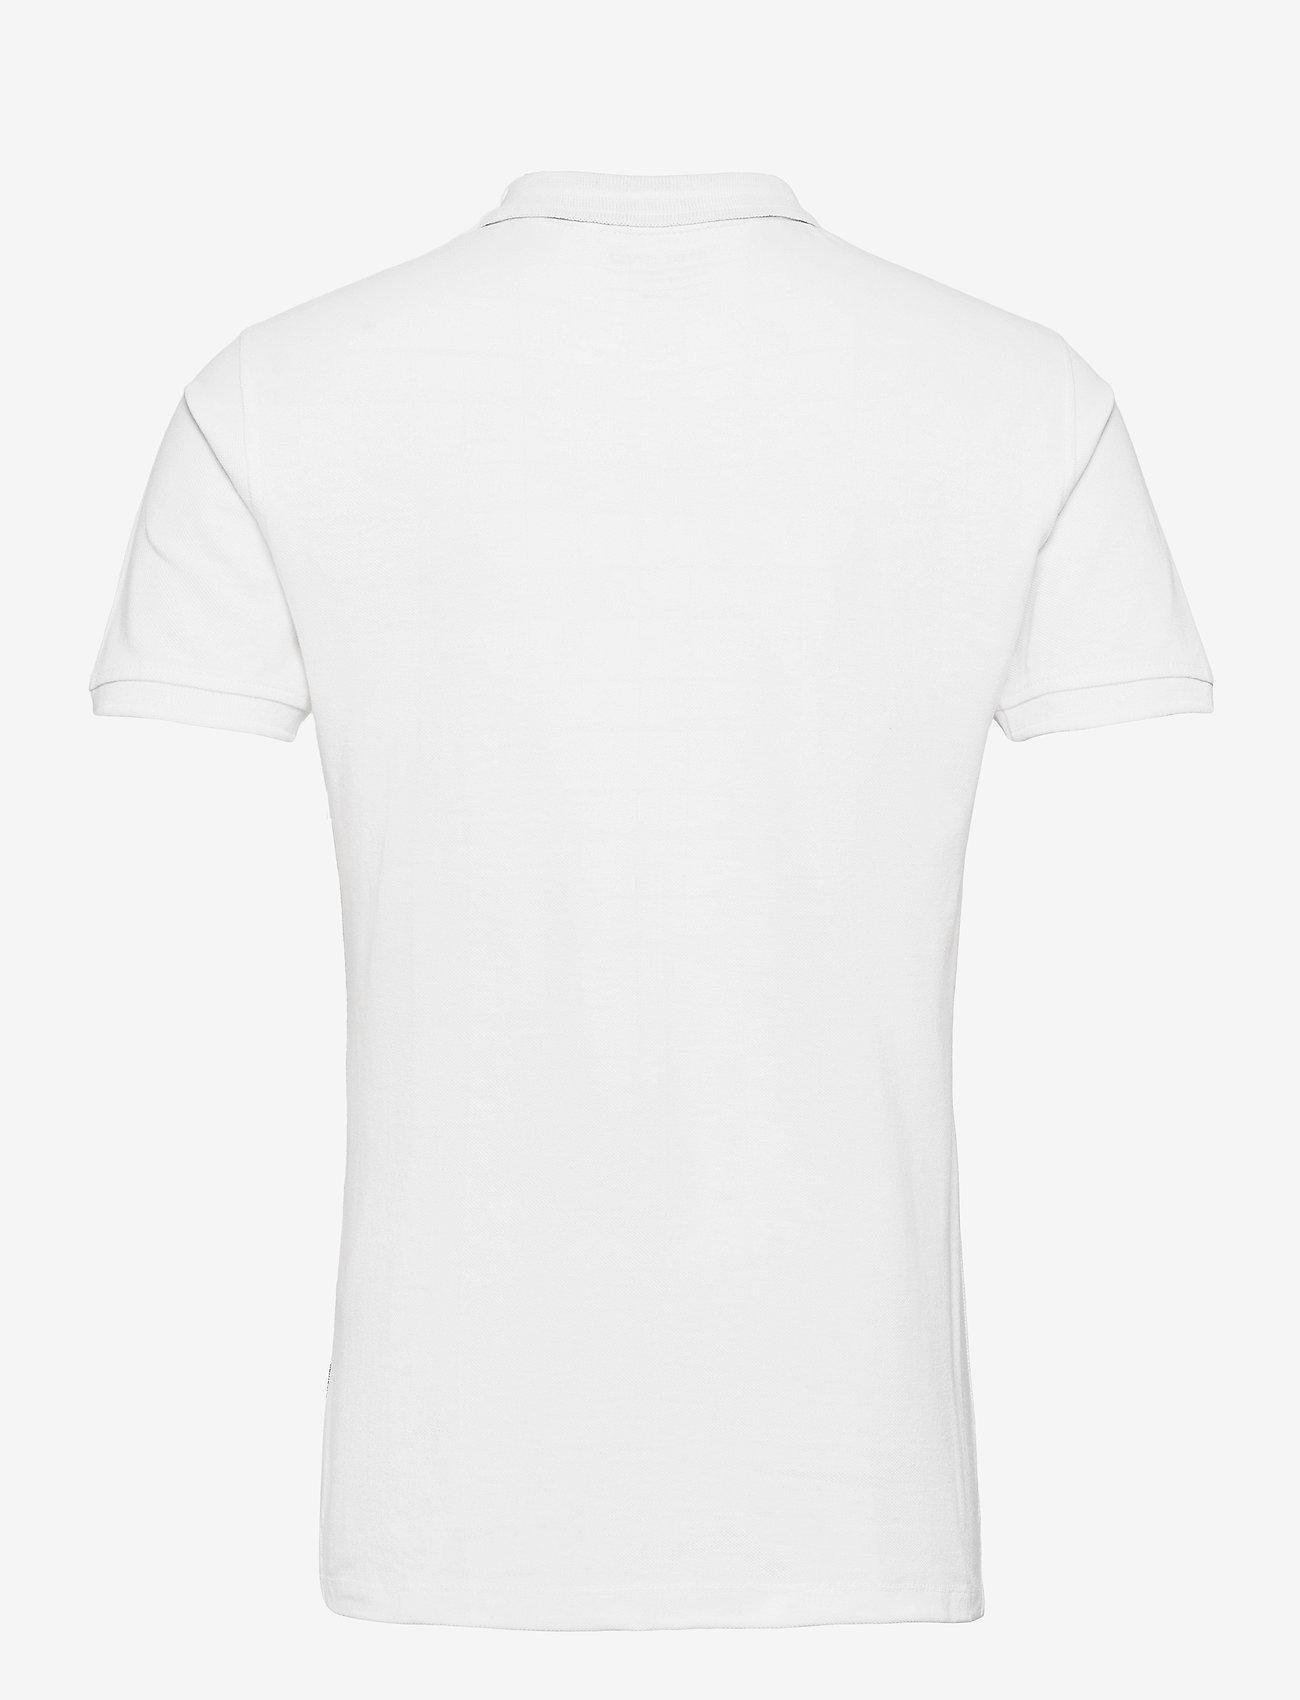 Blend - Poloshirt - krótki rękaw - bright white - 1